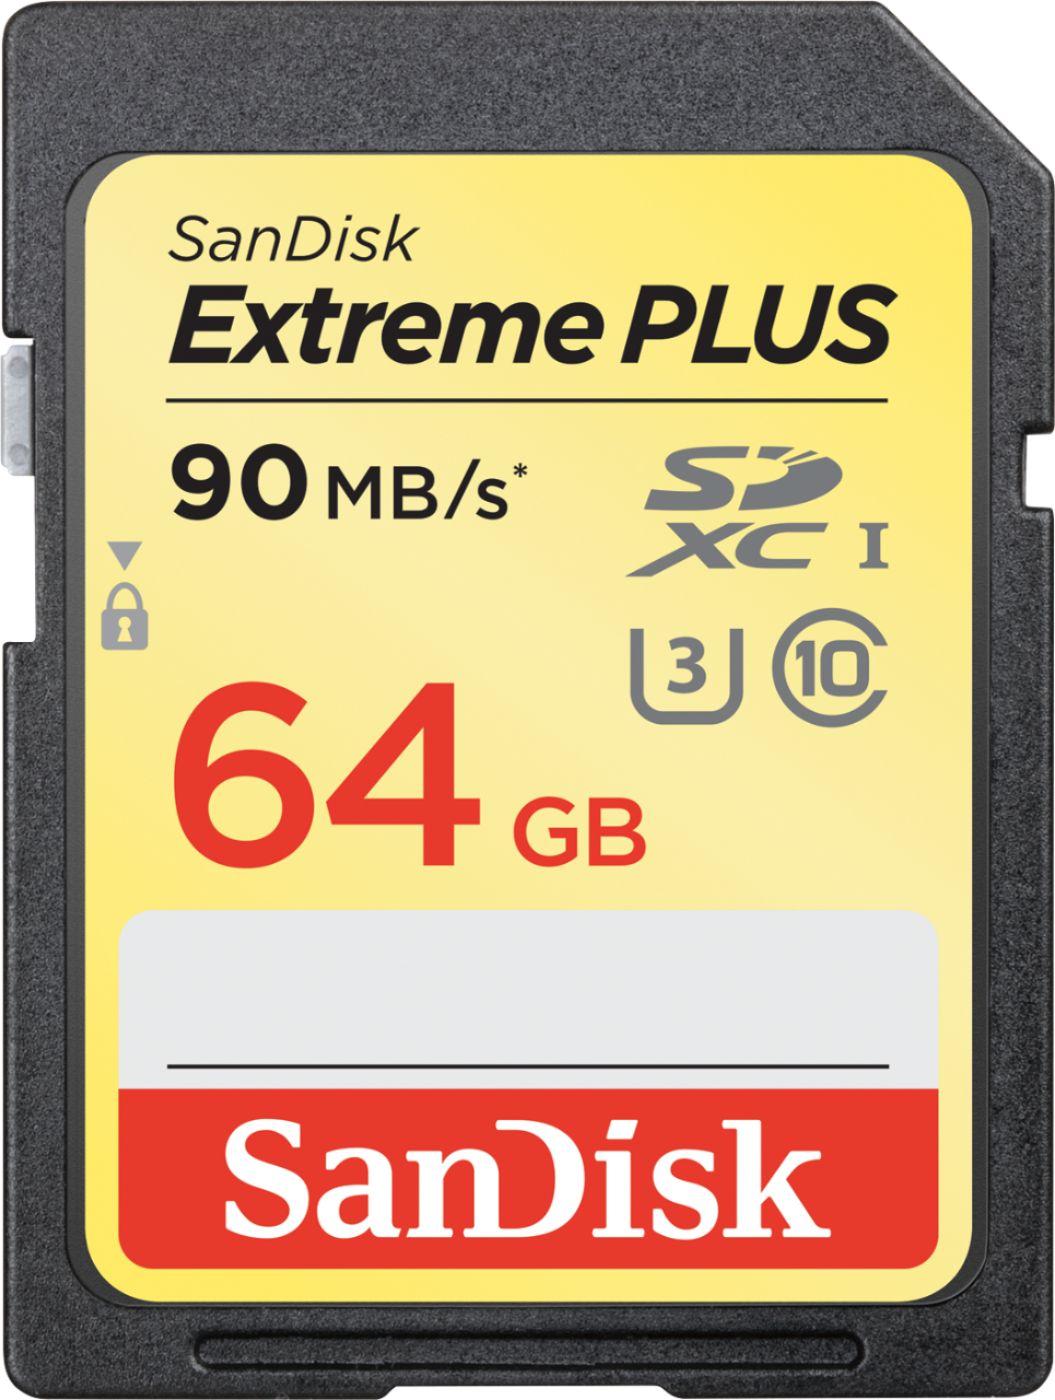 SanDisk - Extreme PLUS 64GB SDXC UHS-I Memory Card